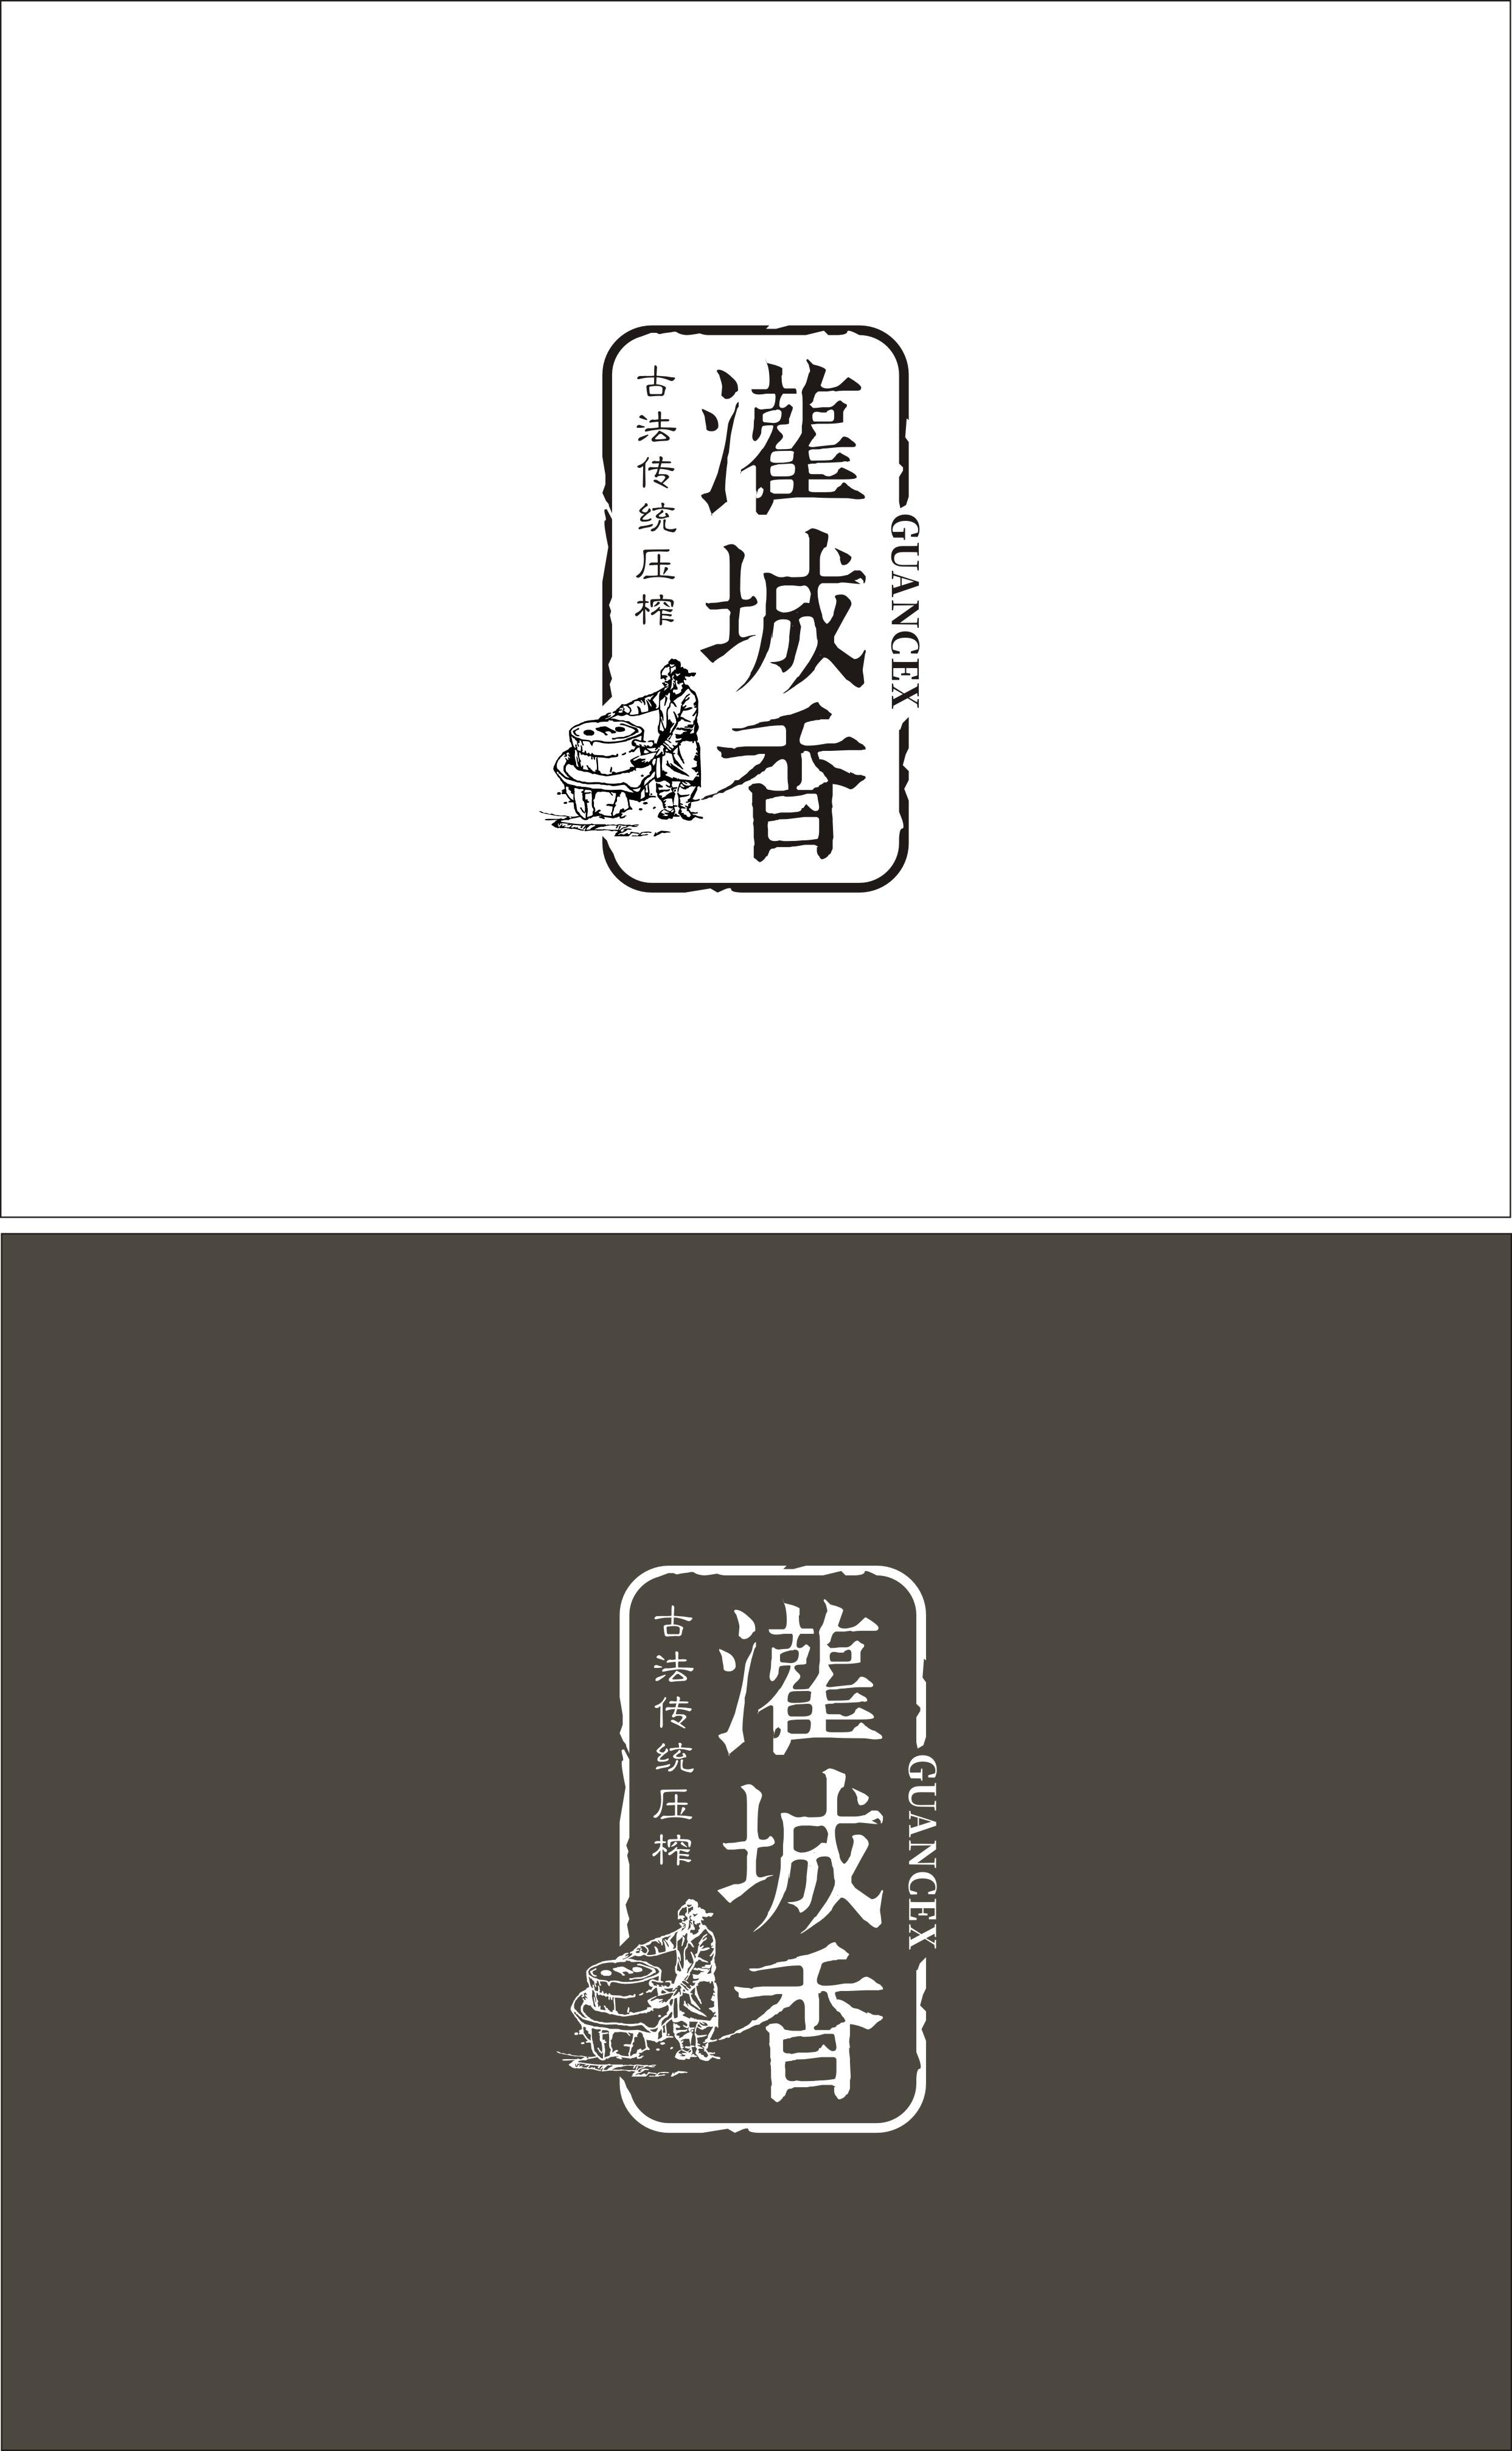 LOGO创意设计,品牌:灌城香(6.11附件有更新)_3033522_k68威客网